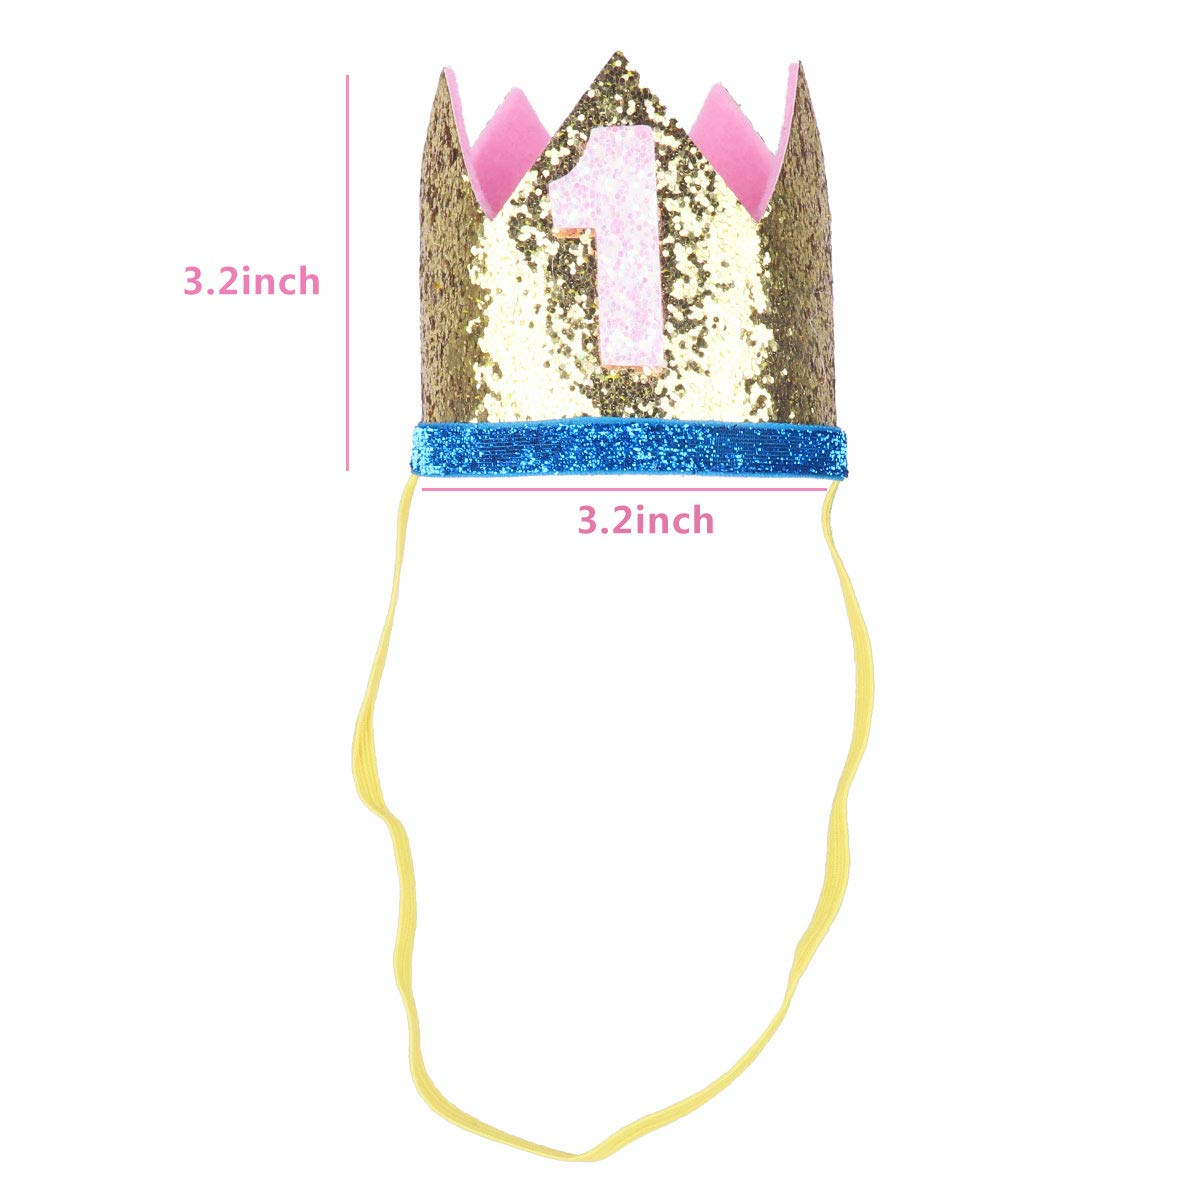 iiniim Baby Girls Boys First /1st Birthday Party Hat Little Prince Crown Headband Head wear Accessories Gold Number 1 One Size by iiniim (Image #5)